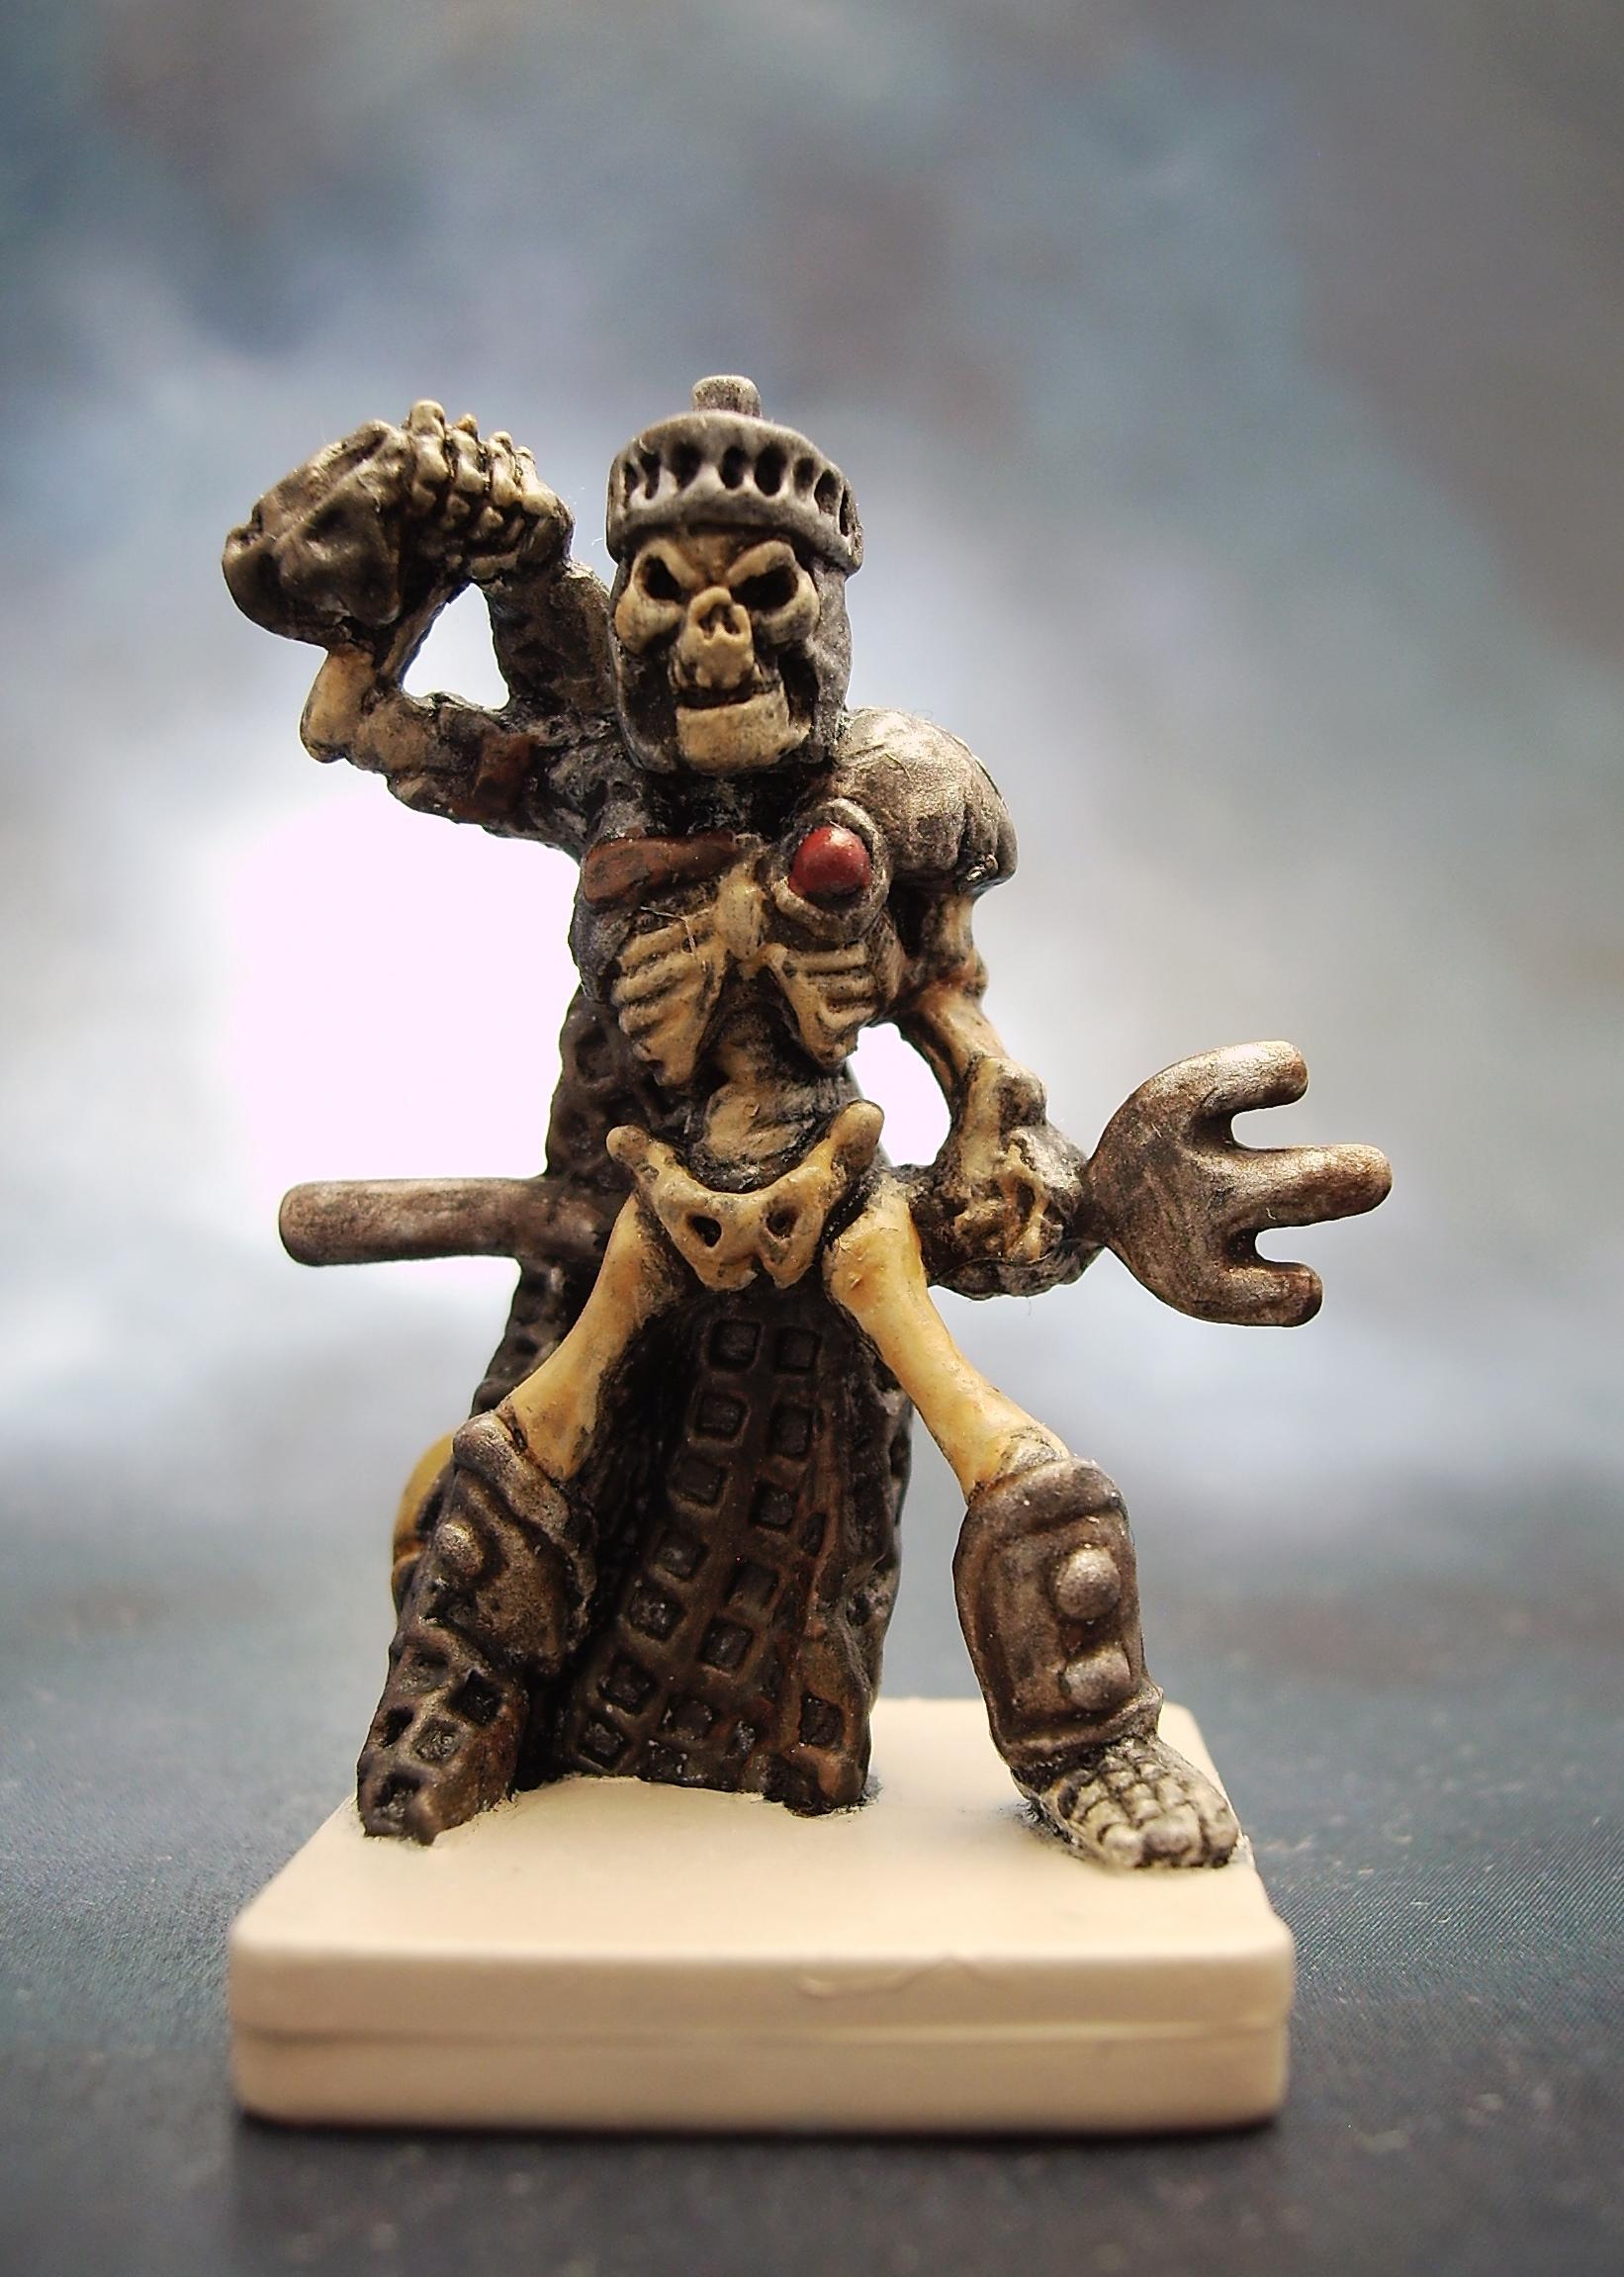 Dungeons And Dragons, Skeletons, Skellington